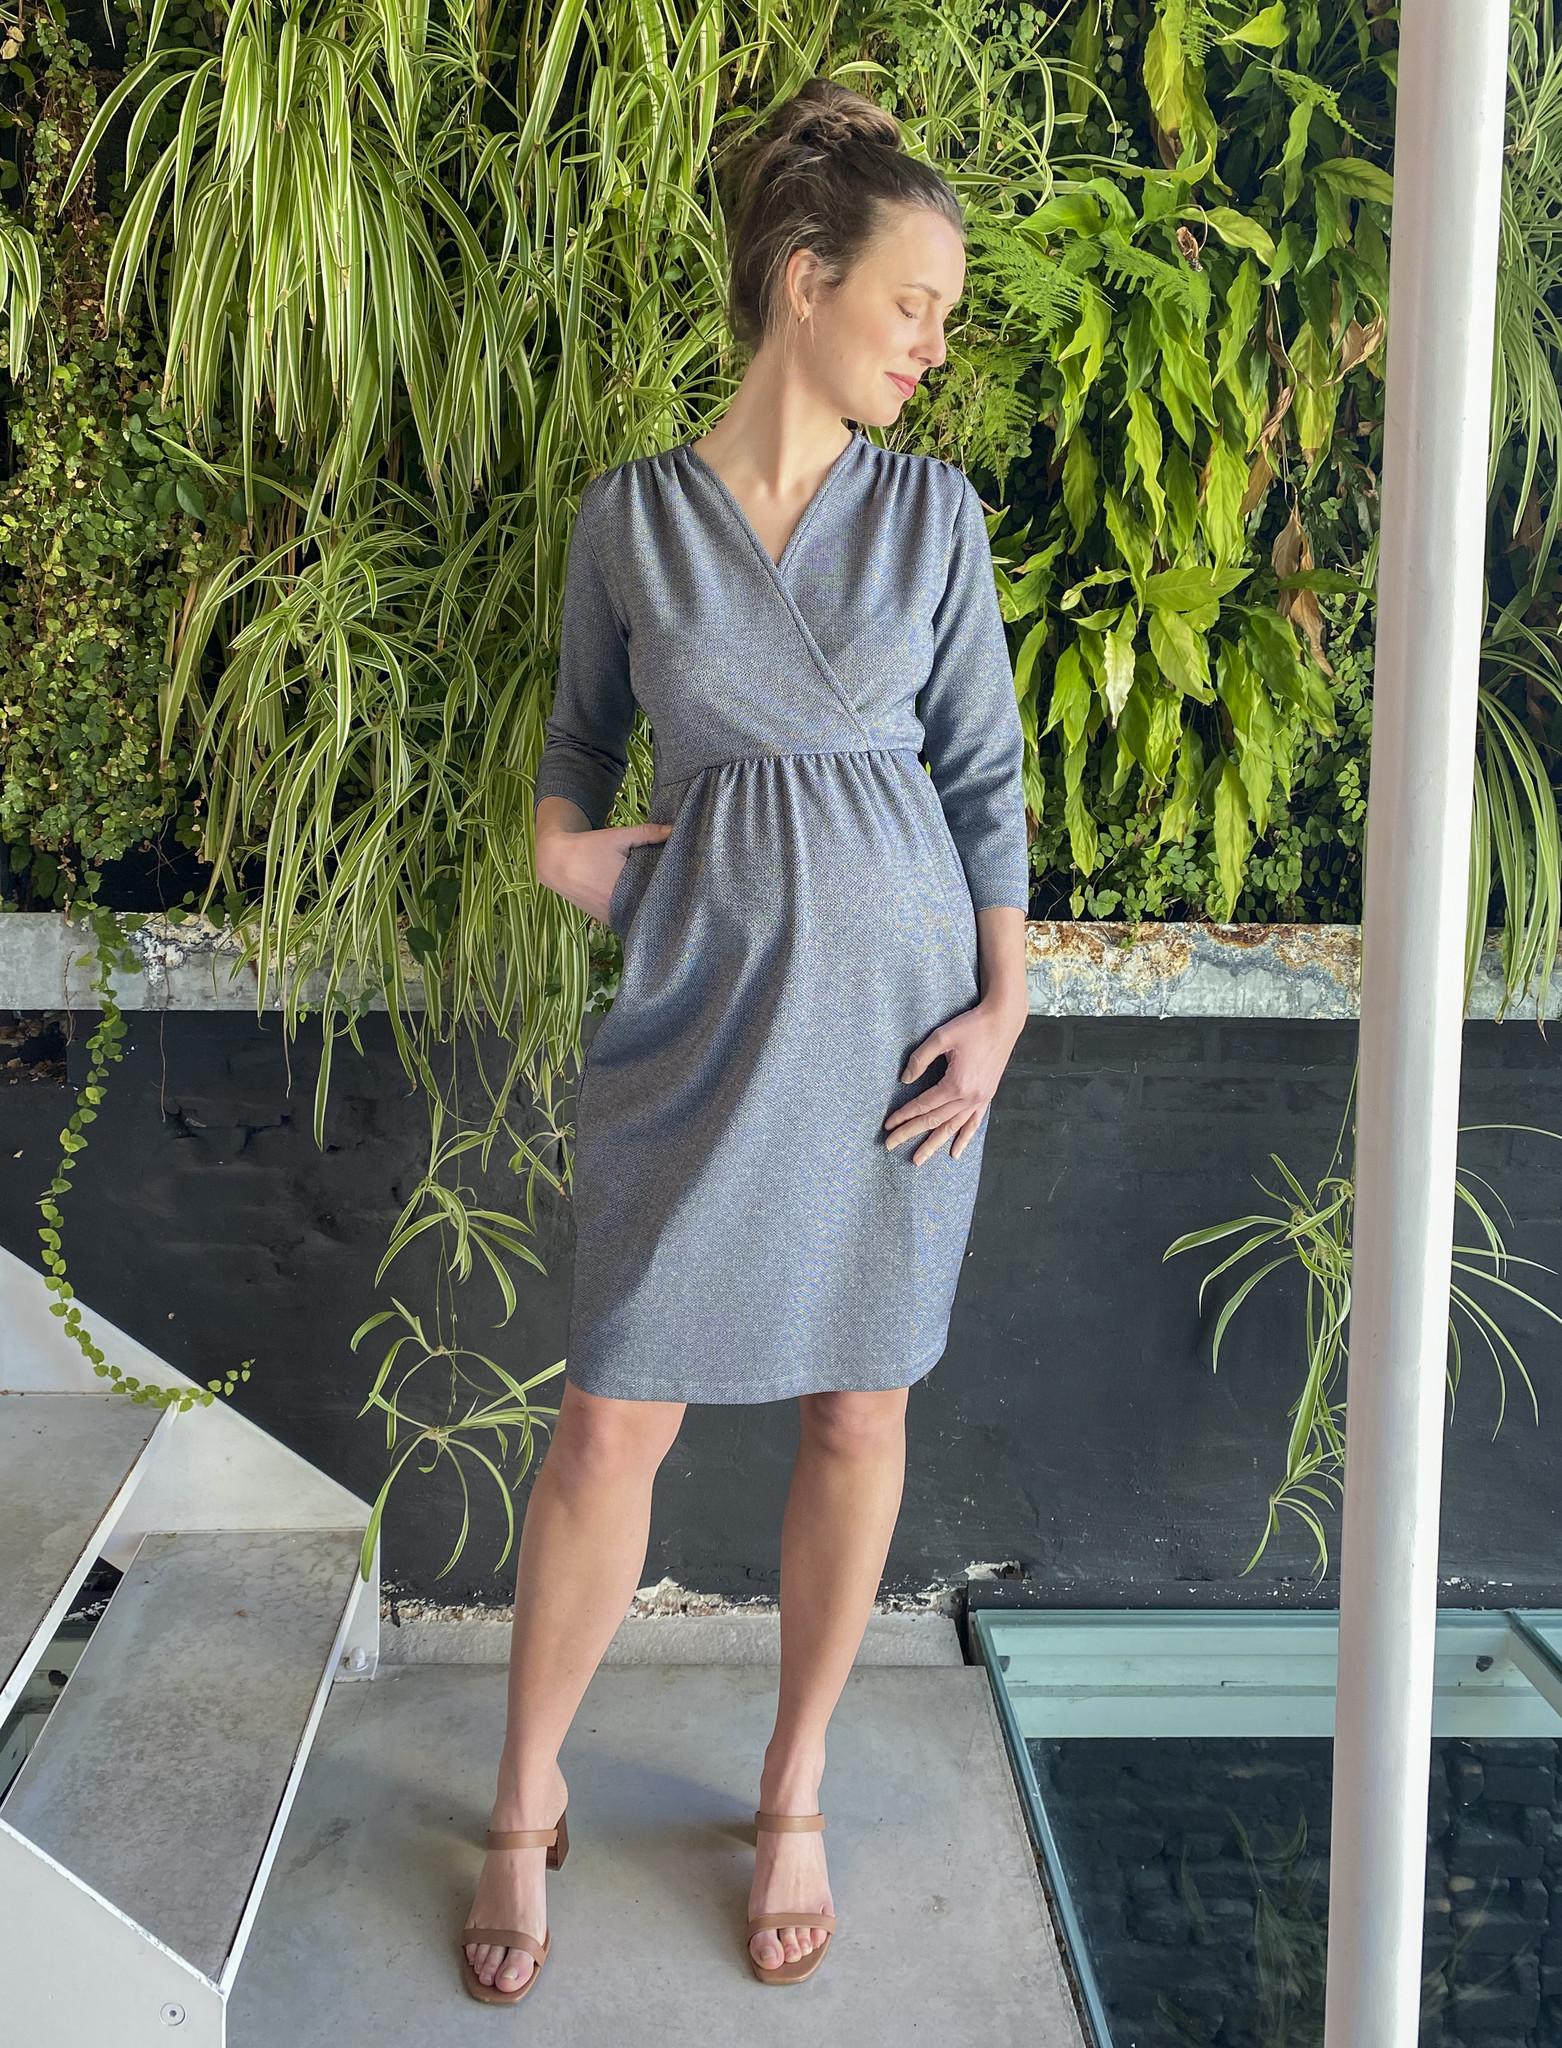 Comfy Dress 7/8 Sleeves Jeans Sparkle-5